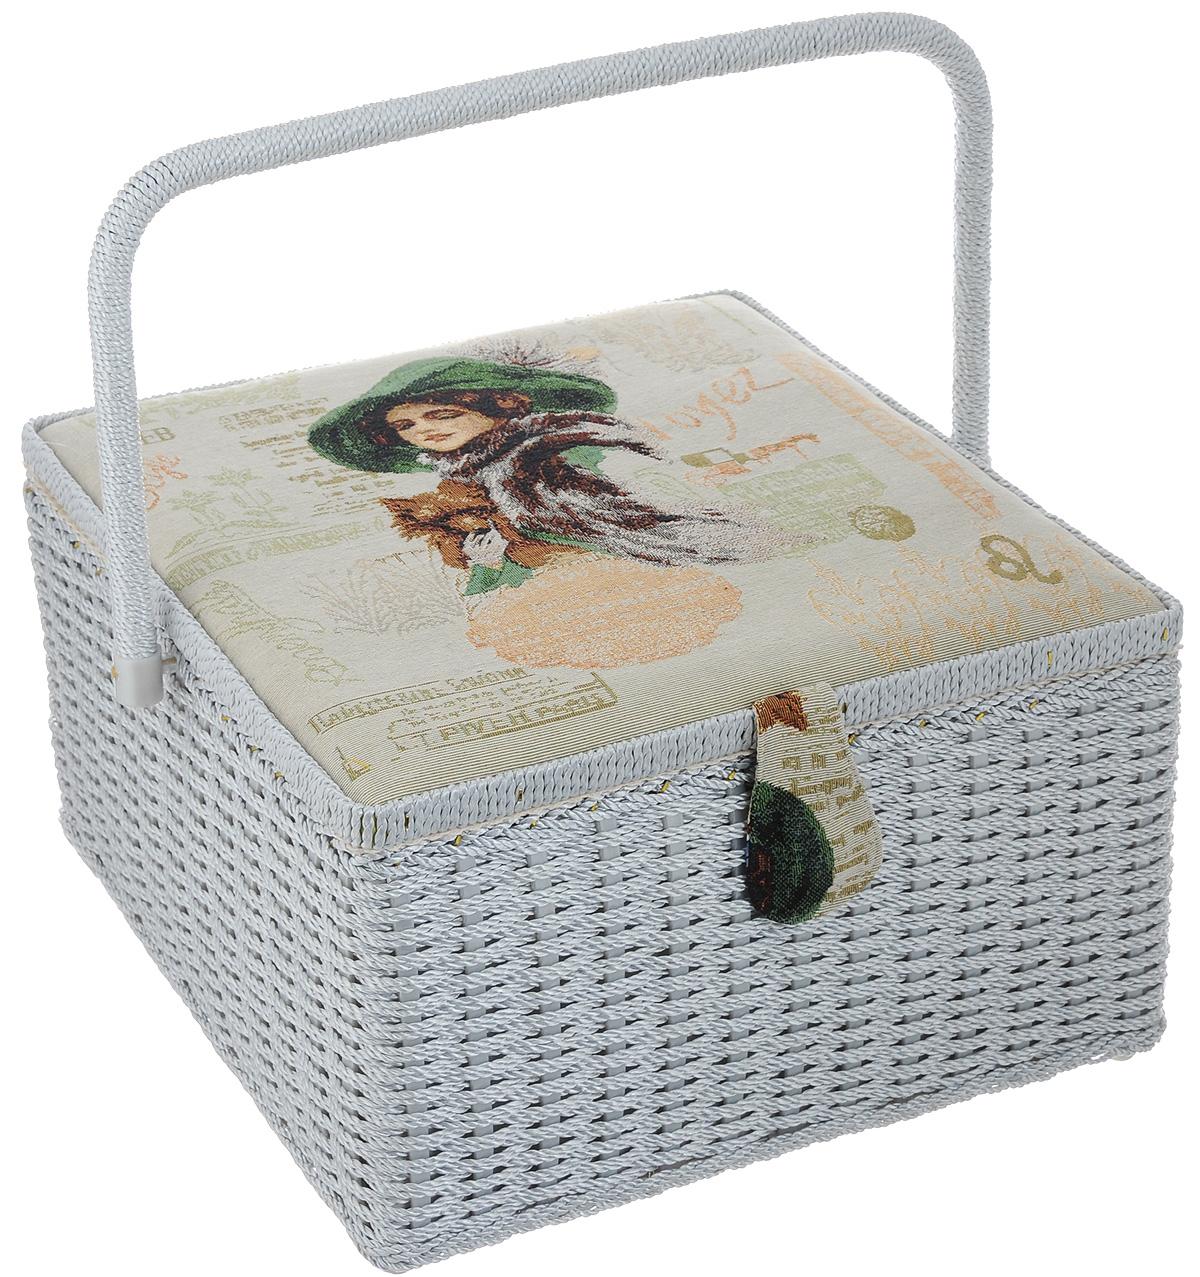 Шкатулка для рукоделия RTO Дама с собачкой, с вкладышем, 32 х 32 х 20 см рамка для фото rto miniatures 2 5 х 3 5 см vt 125